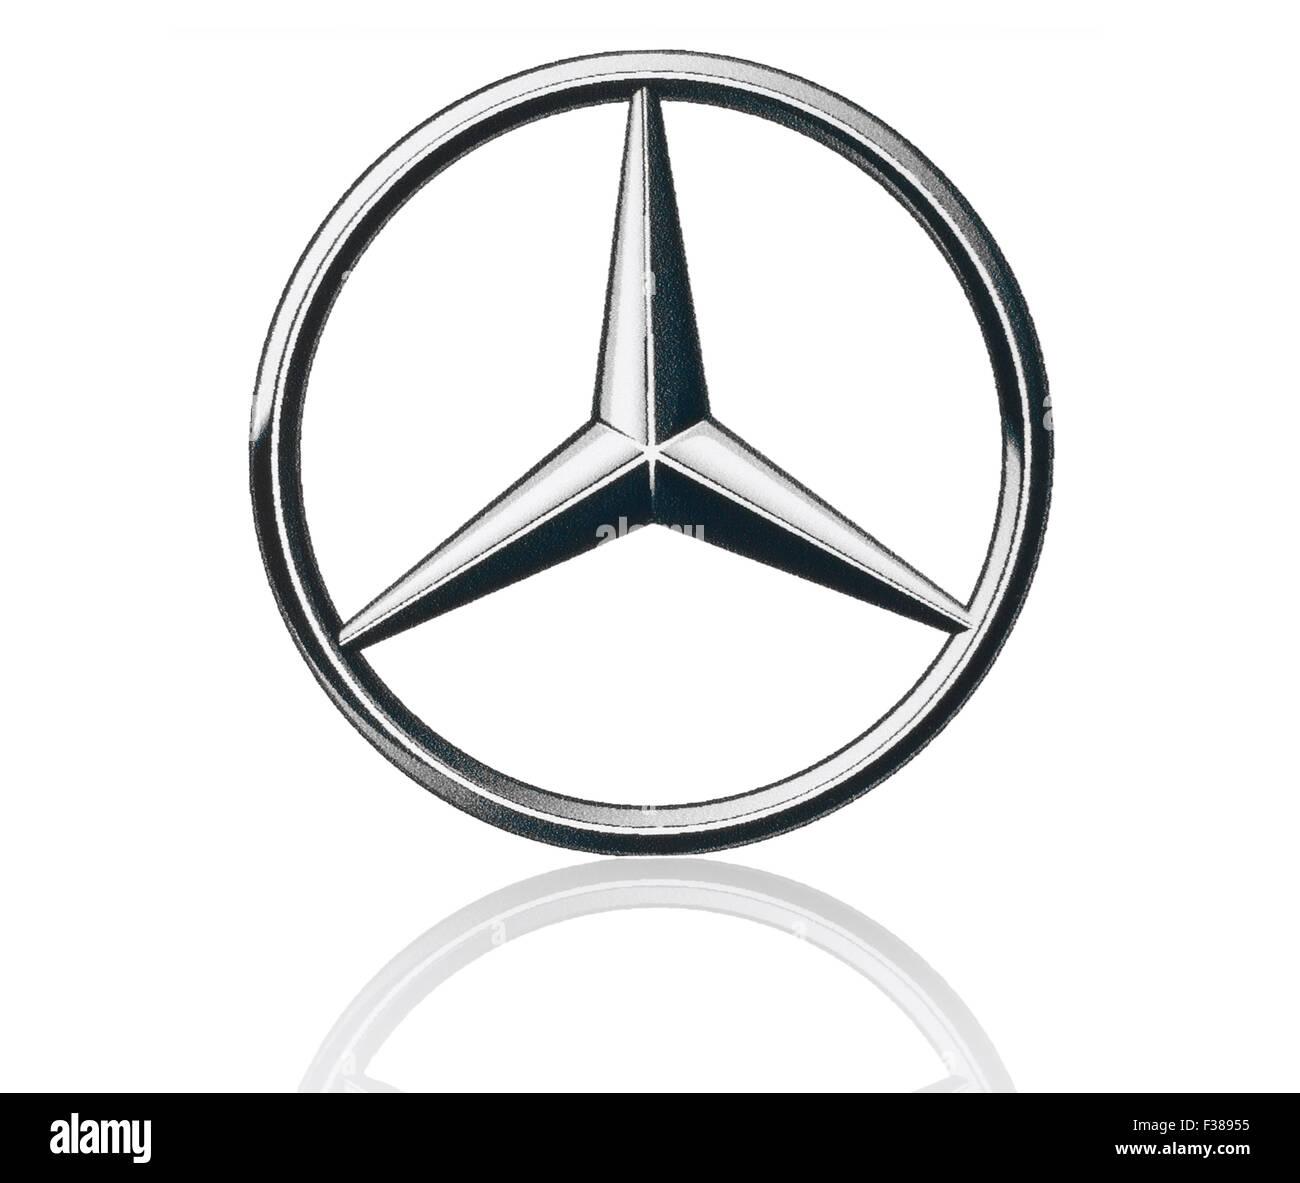 Mercedes Benz Star Logo >> Mercedes Benz Logo On Front Photos & Mercedes Benz Logo On Front Images - Alamy